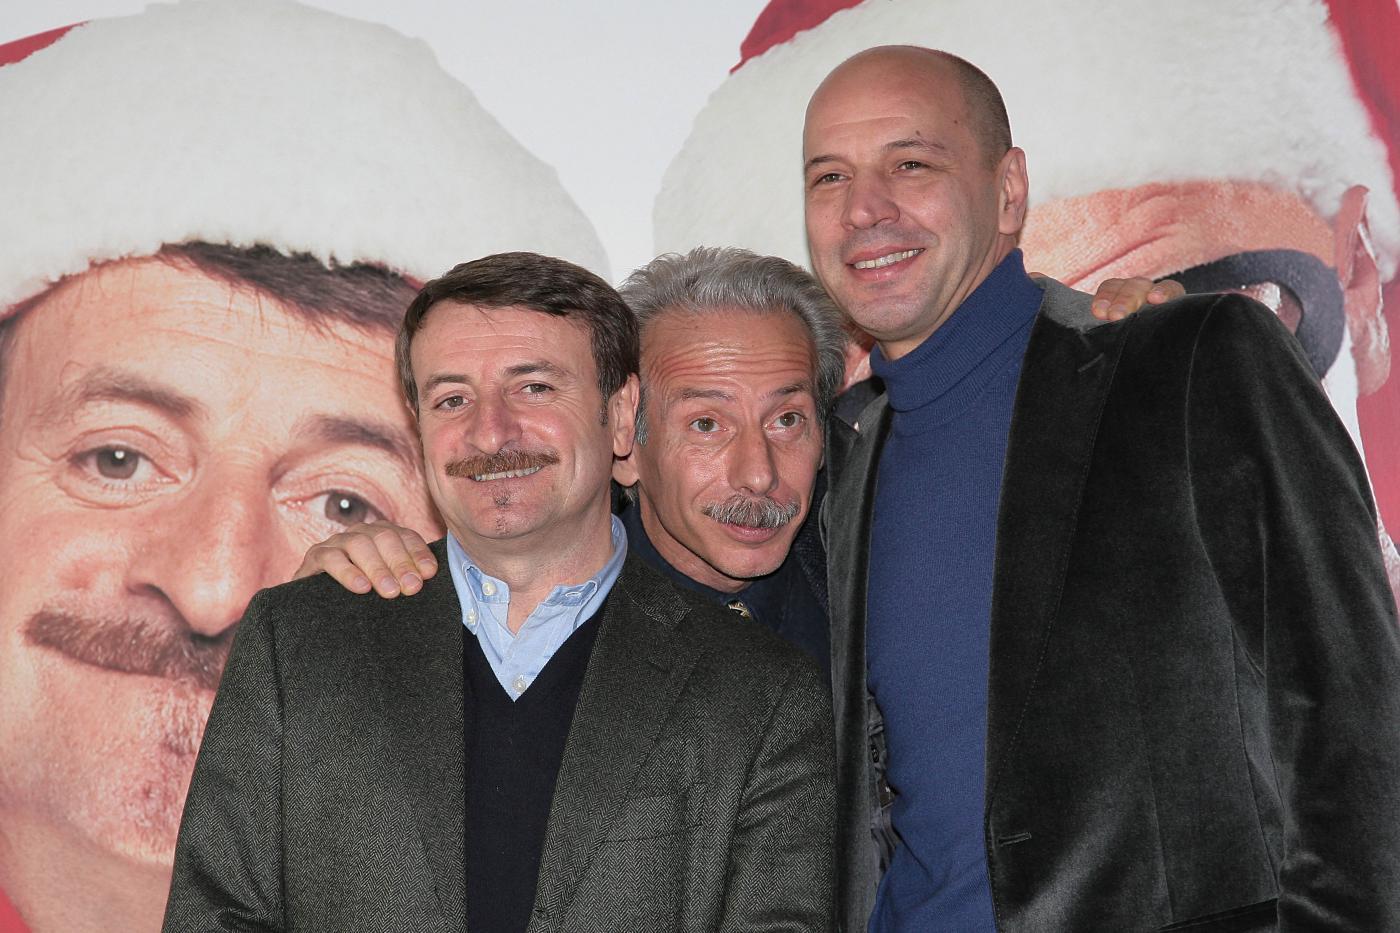 Aldo Giovanni e Giacomo nuovo film Natale 2016